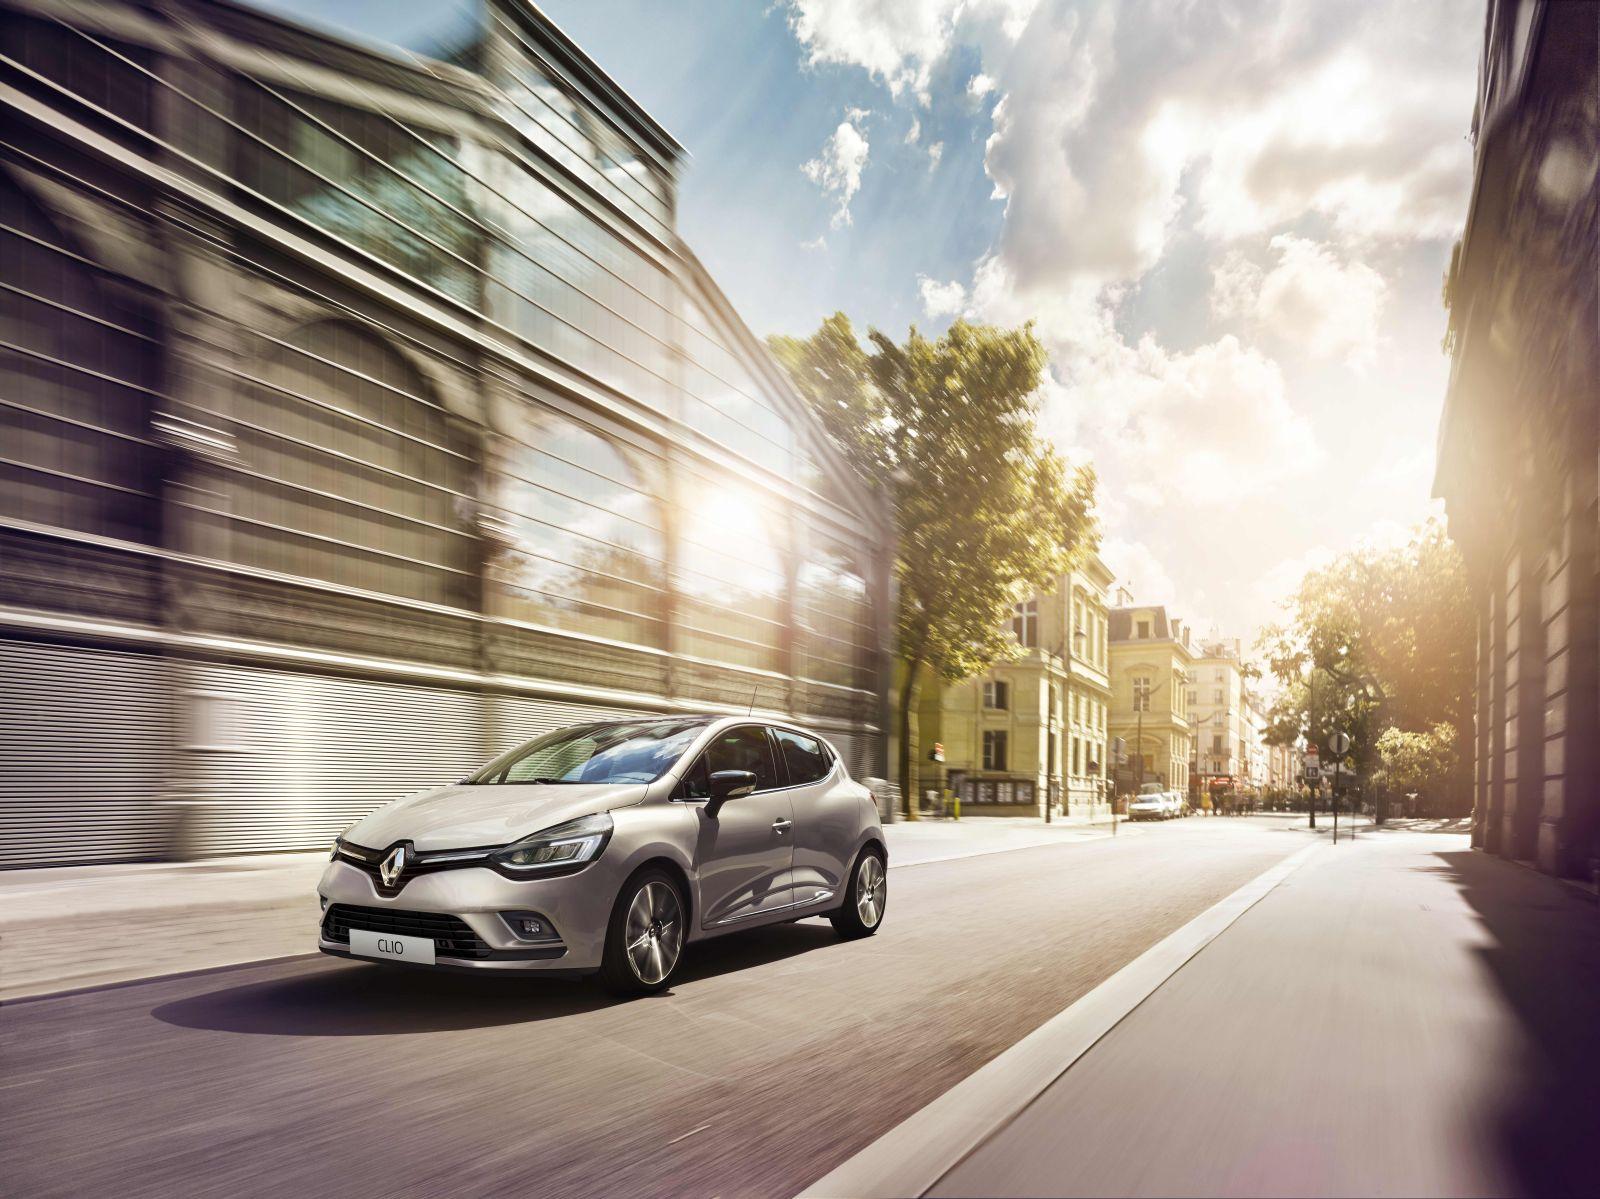 New 2017 Renault Clio (7)